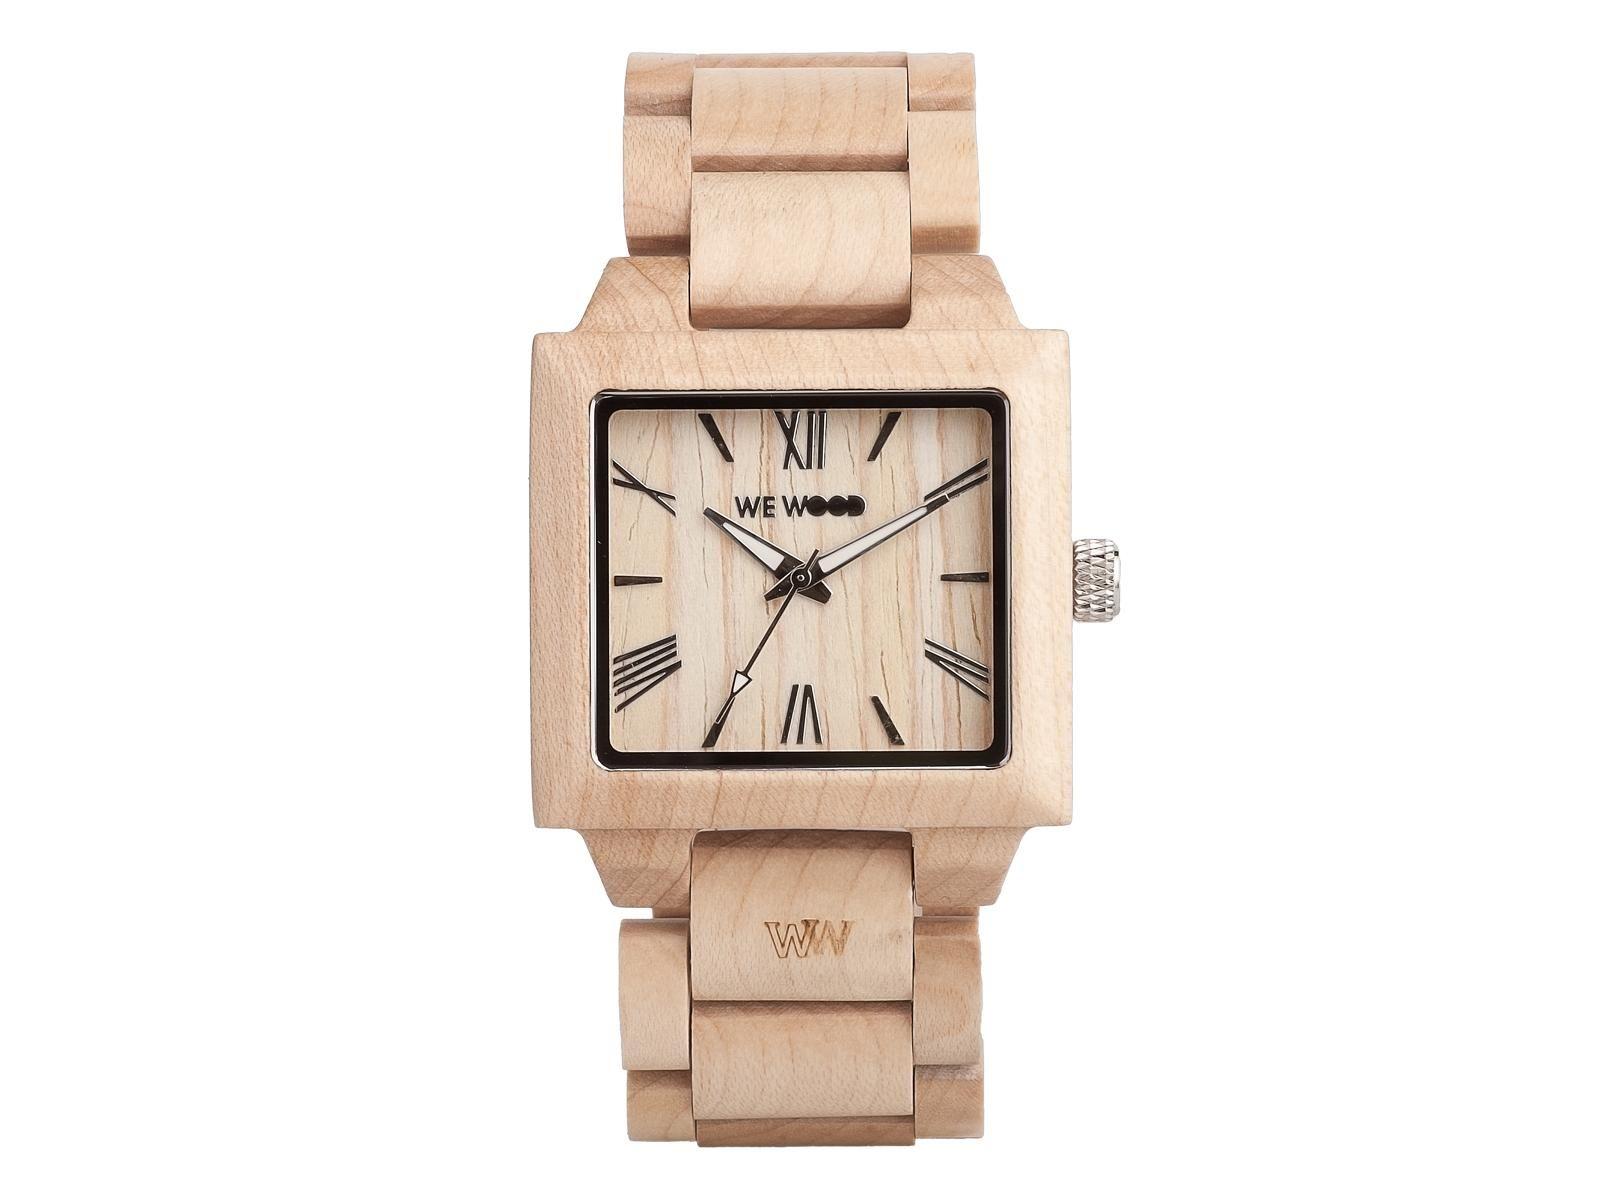 Wewood Callisto Watch Ahalife Wewood Wood Watch Beige